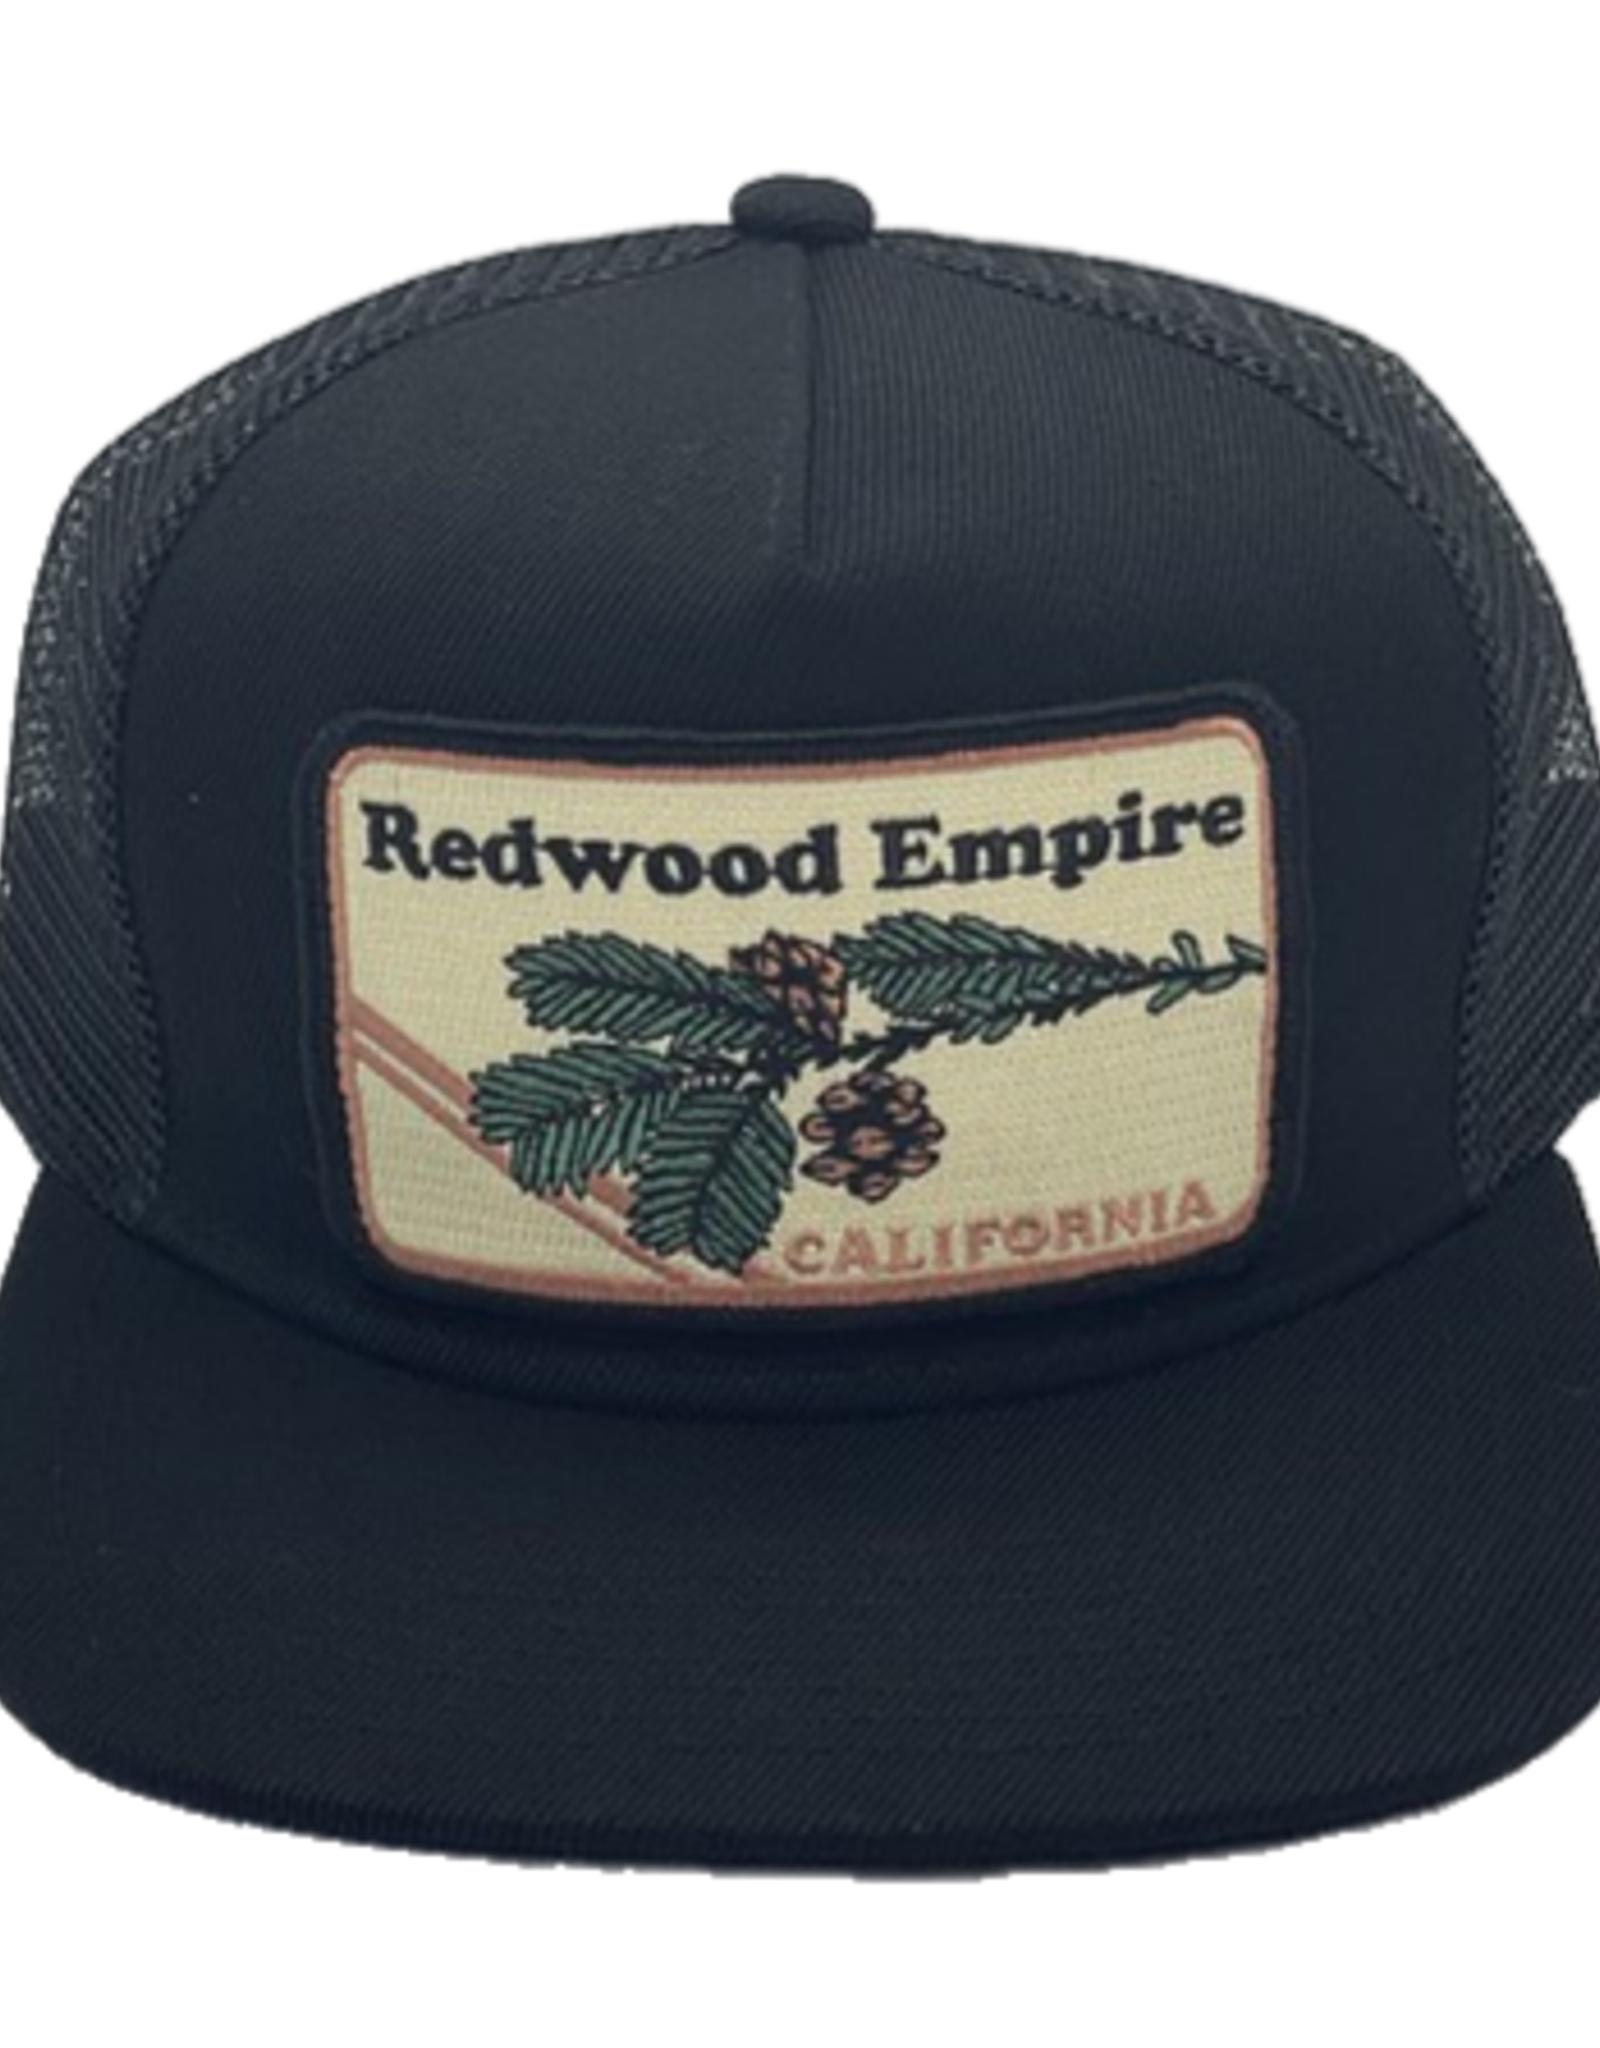 BART BRIDGE TRUCKER HAT WITH SECRET POCKET REDWOOD EMPIRE BRANCH BLACK